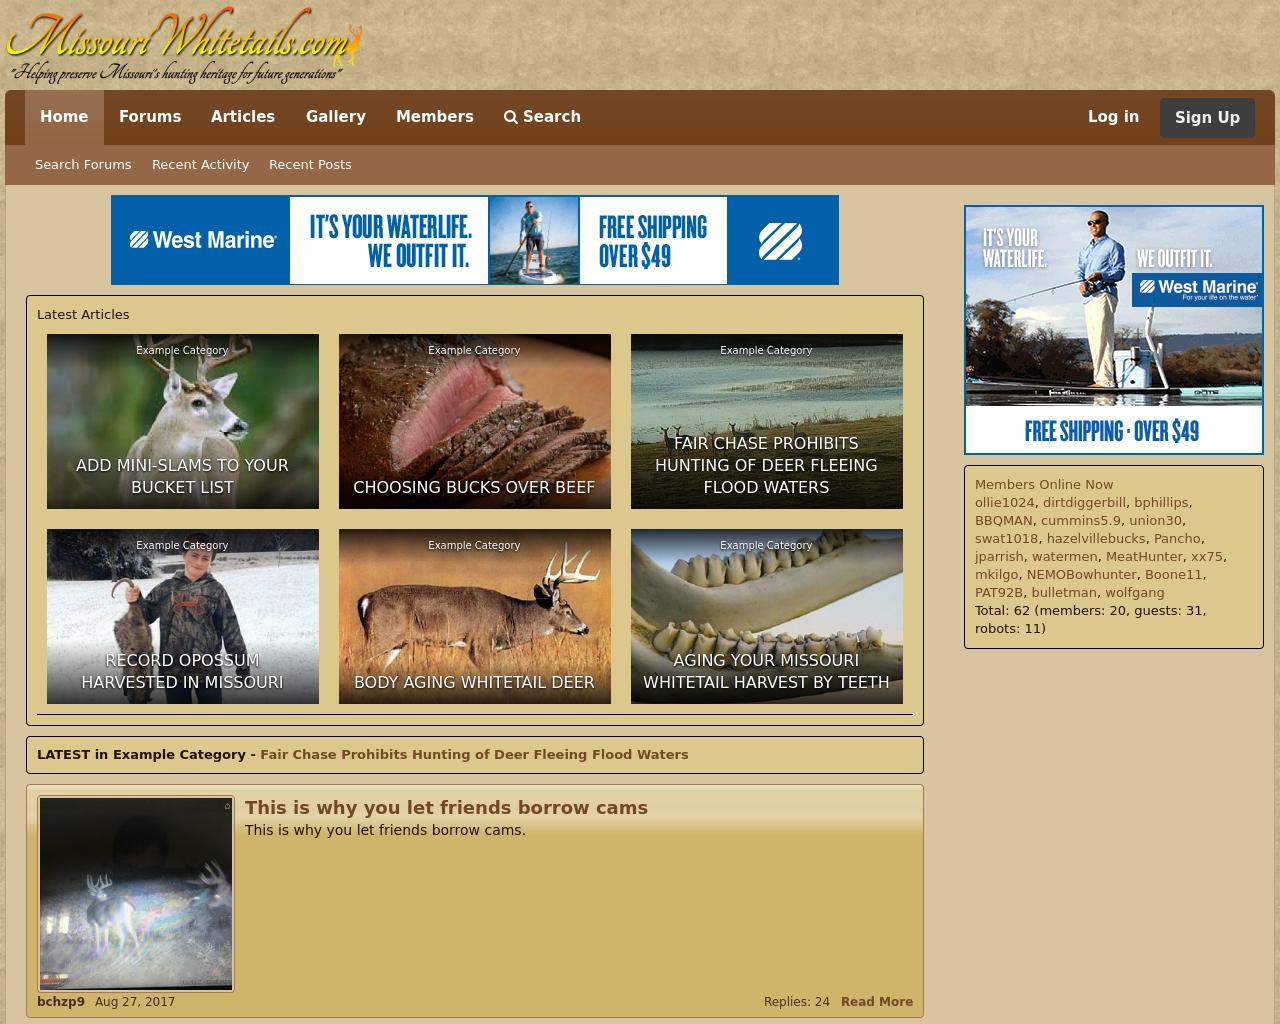 Missouri-Whitetails-Advertising-Reviews-Pricing